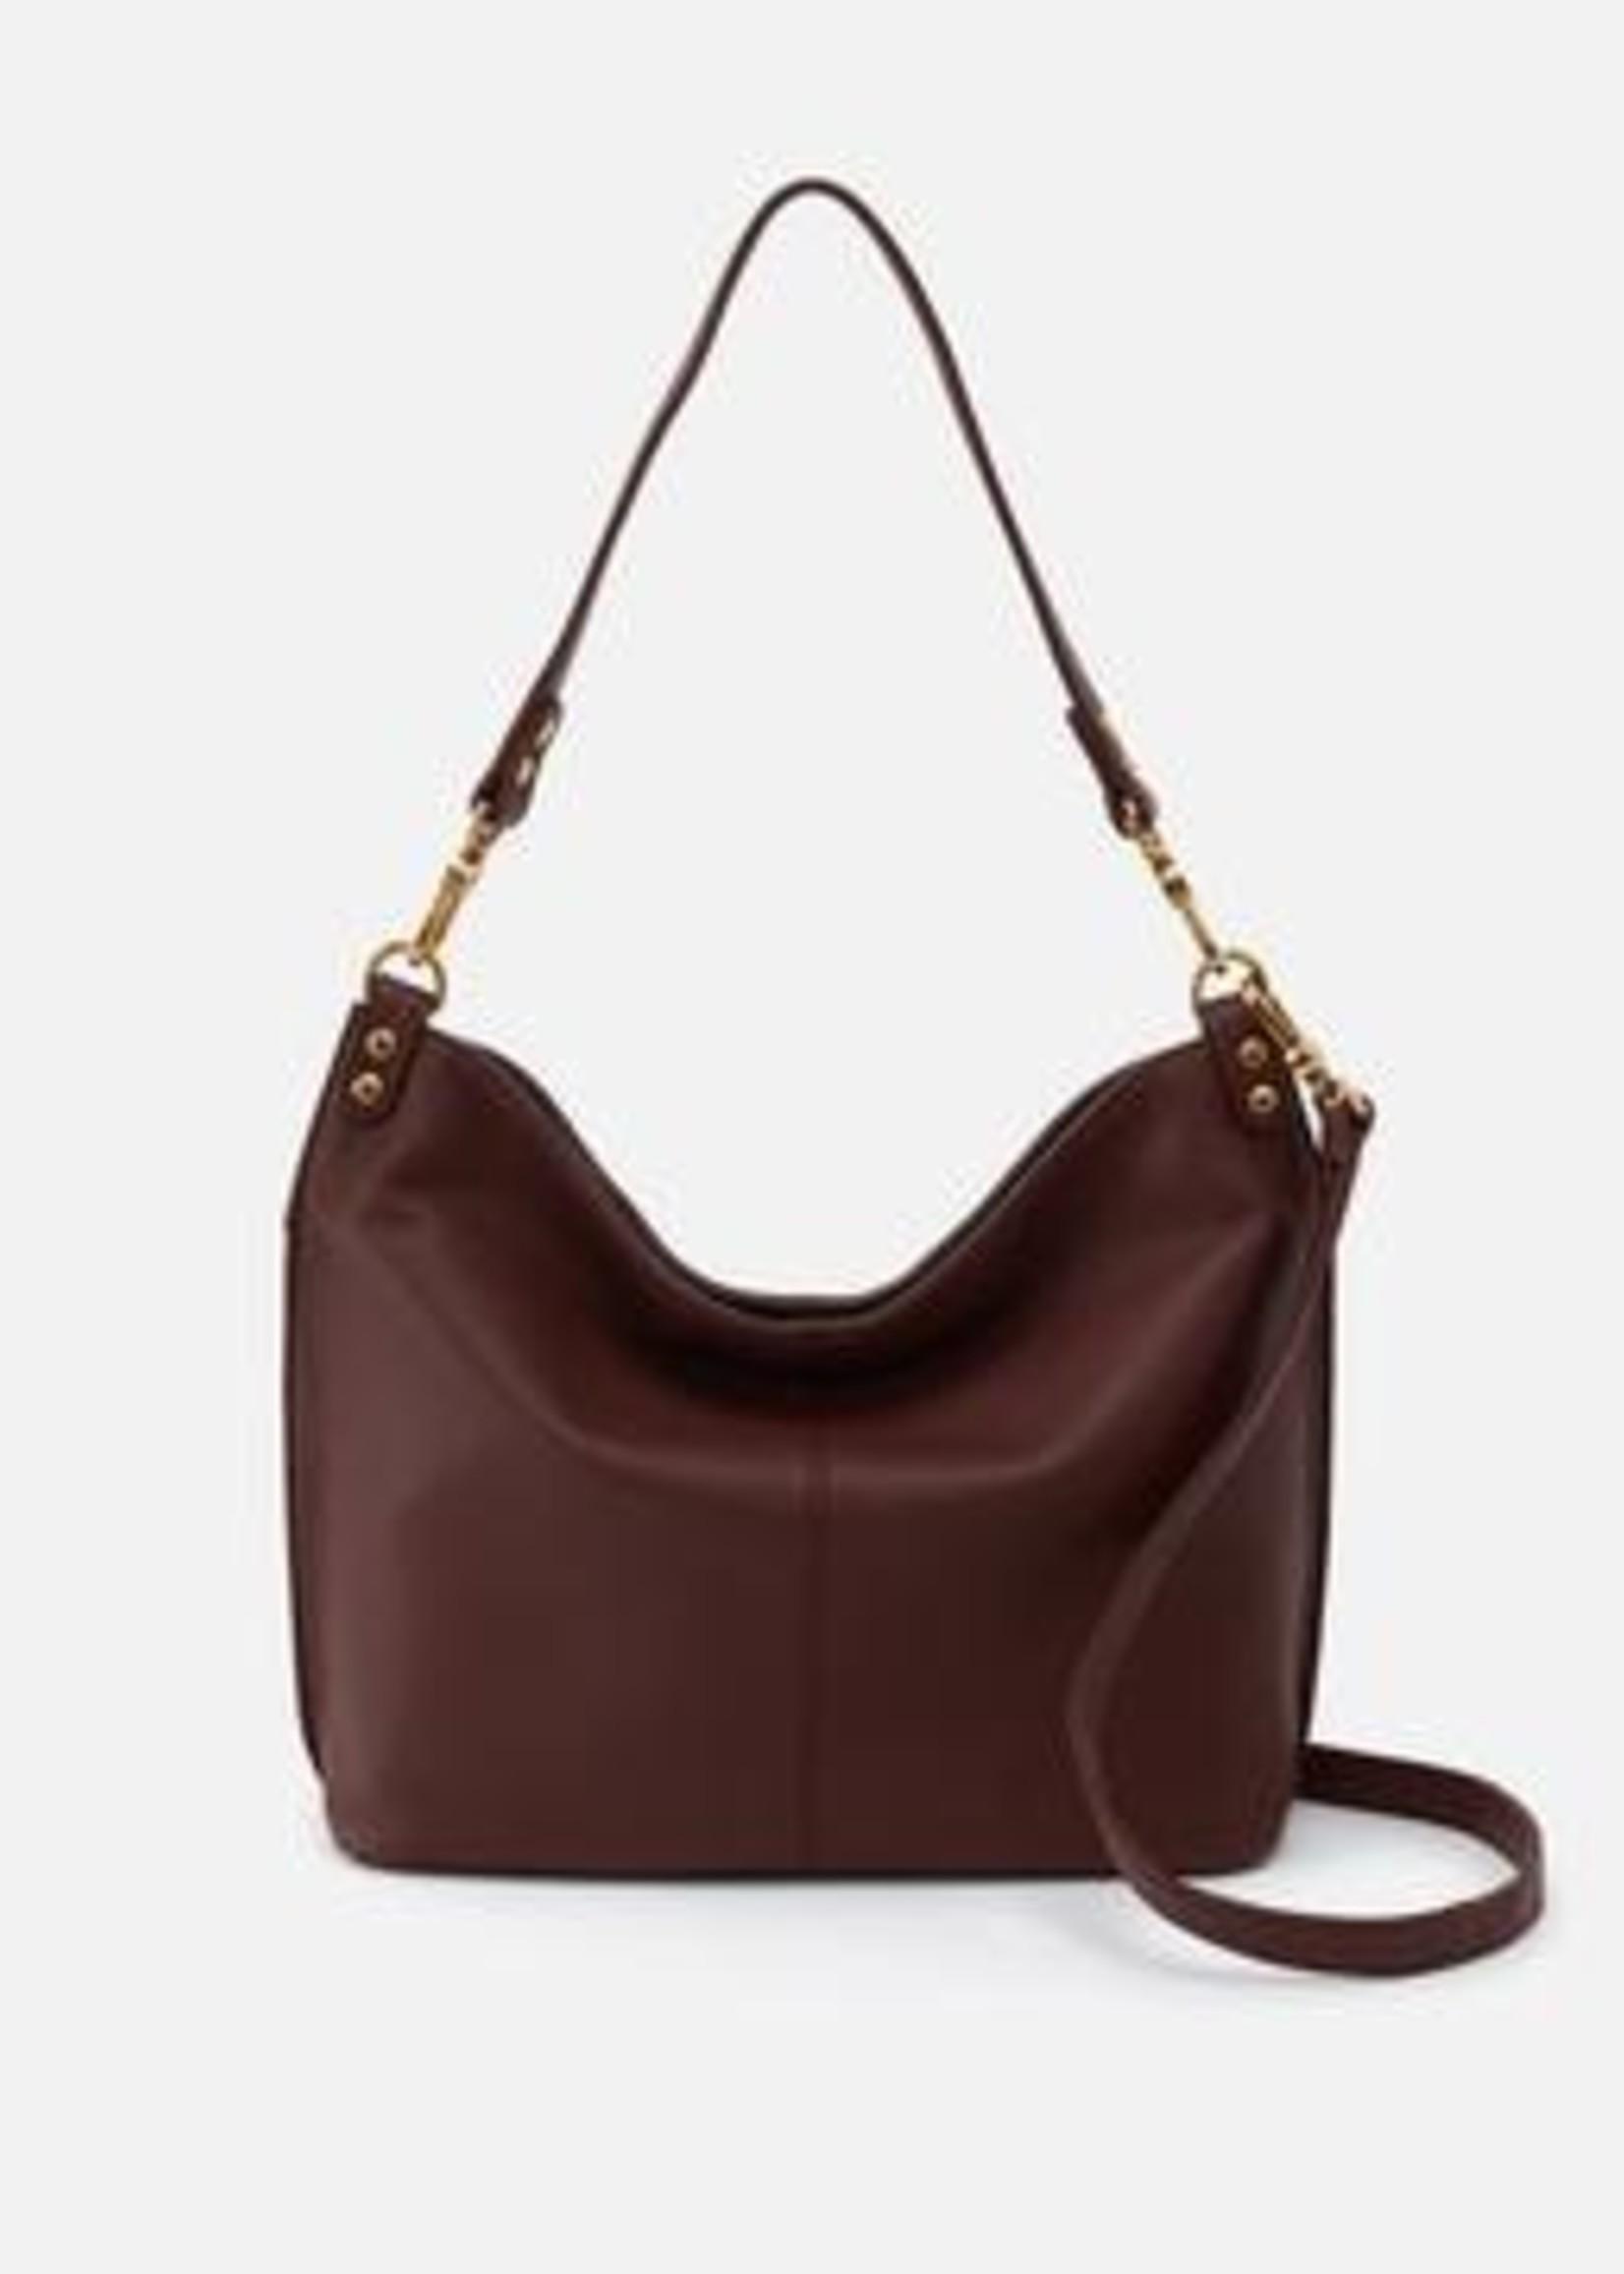 HOBO Bags Pier Shoulder Bag Mahogany